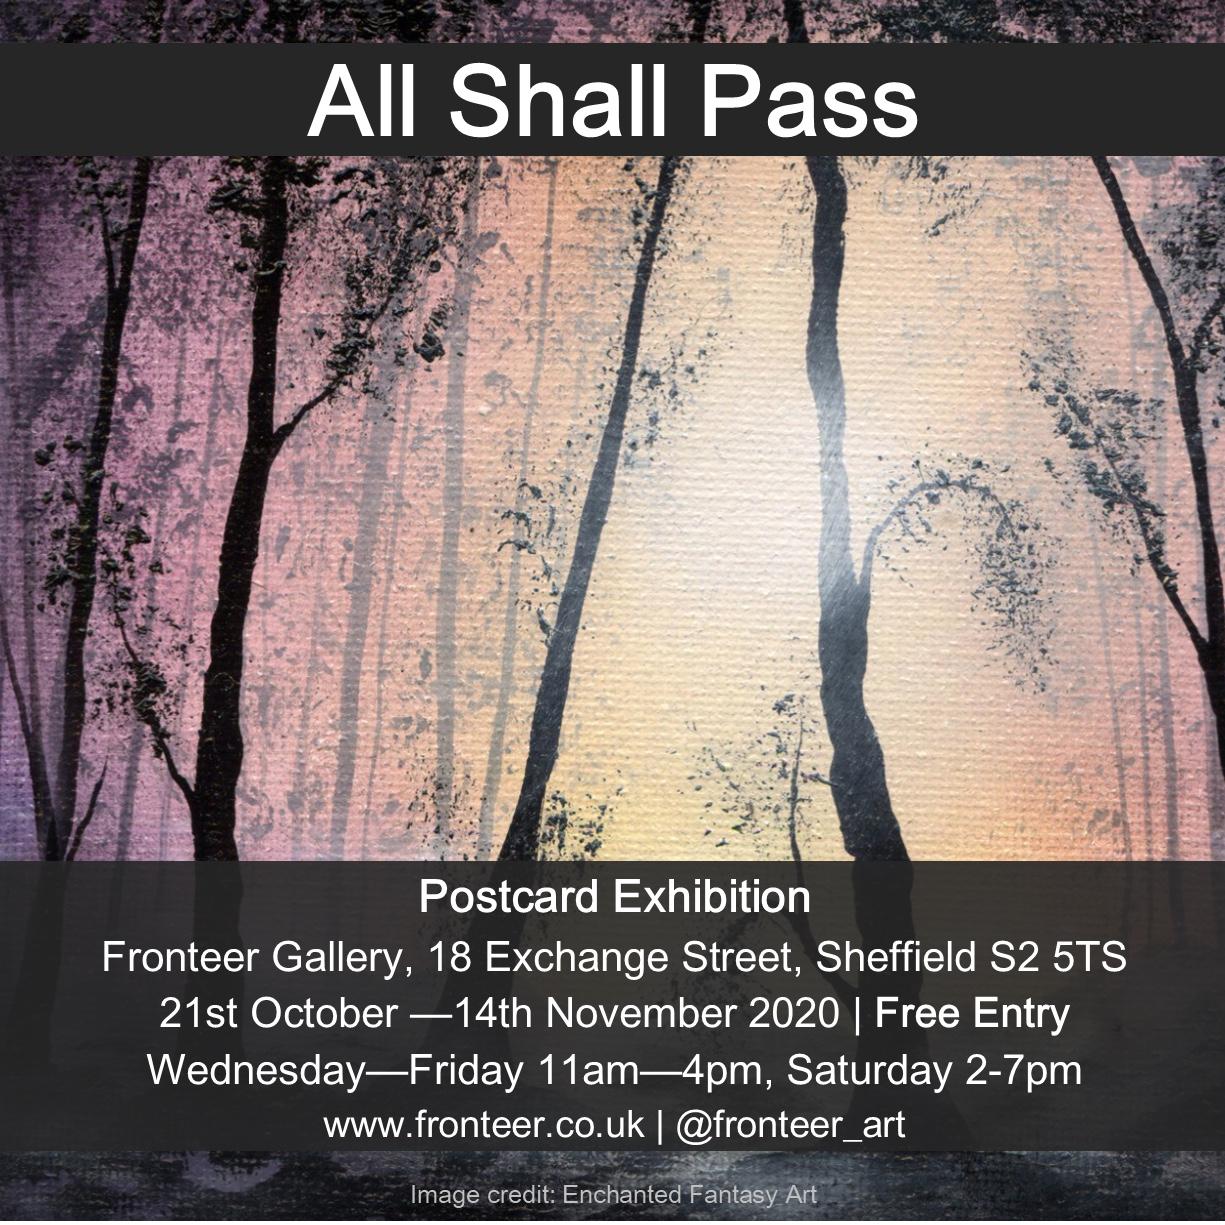 All Shall Pass